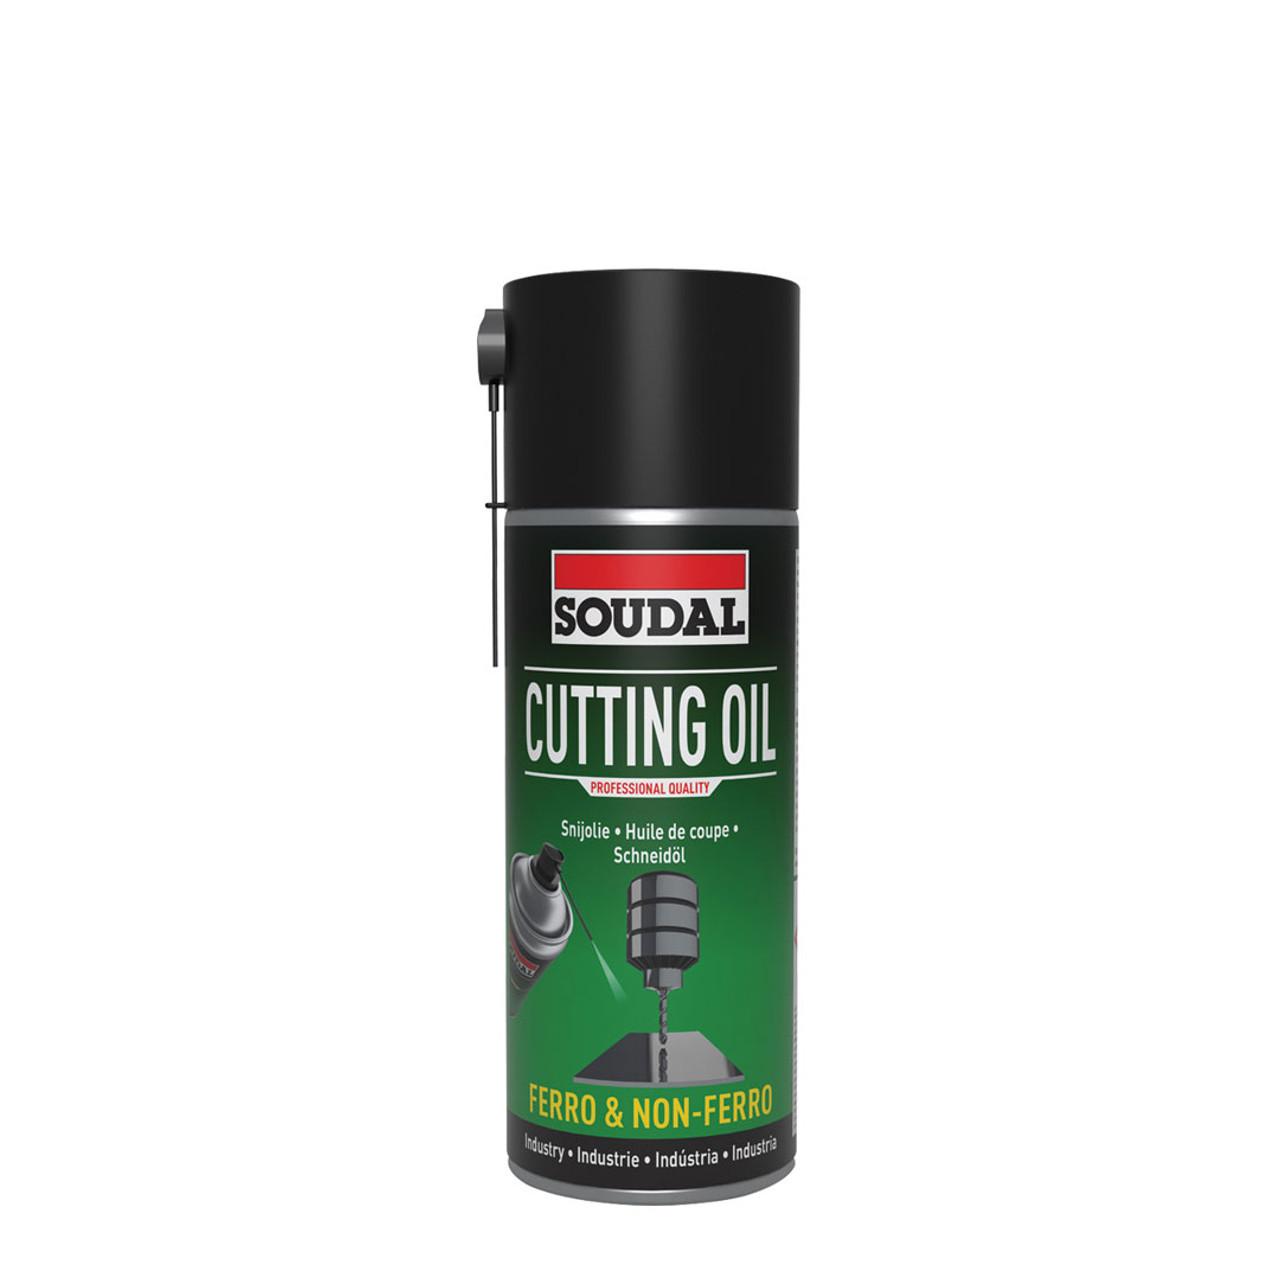 Soudal Cutting Oil 400ml